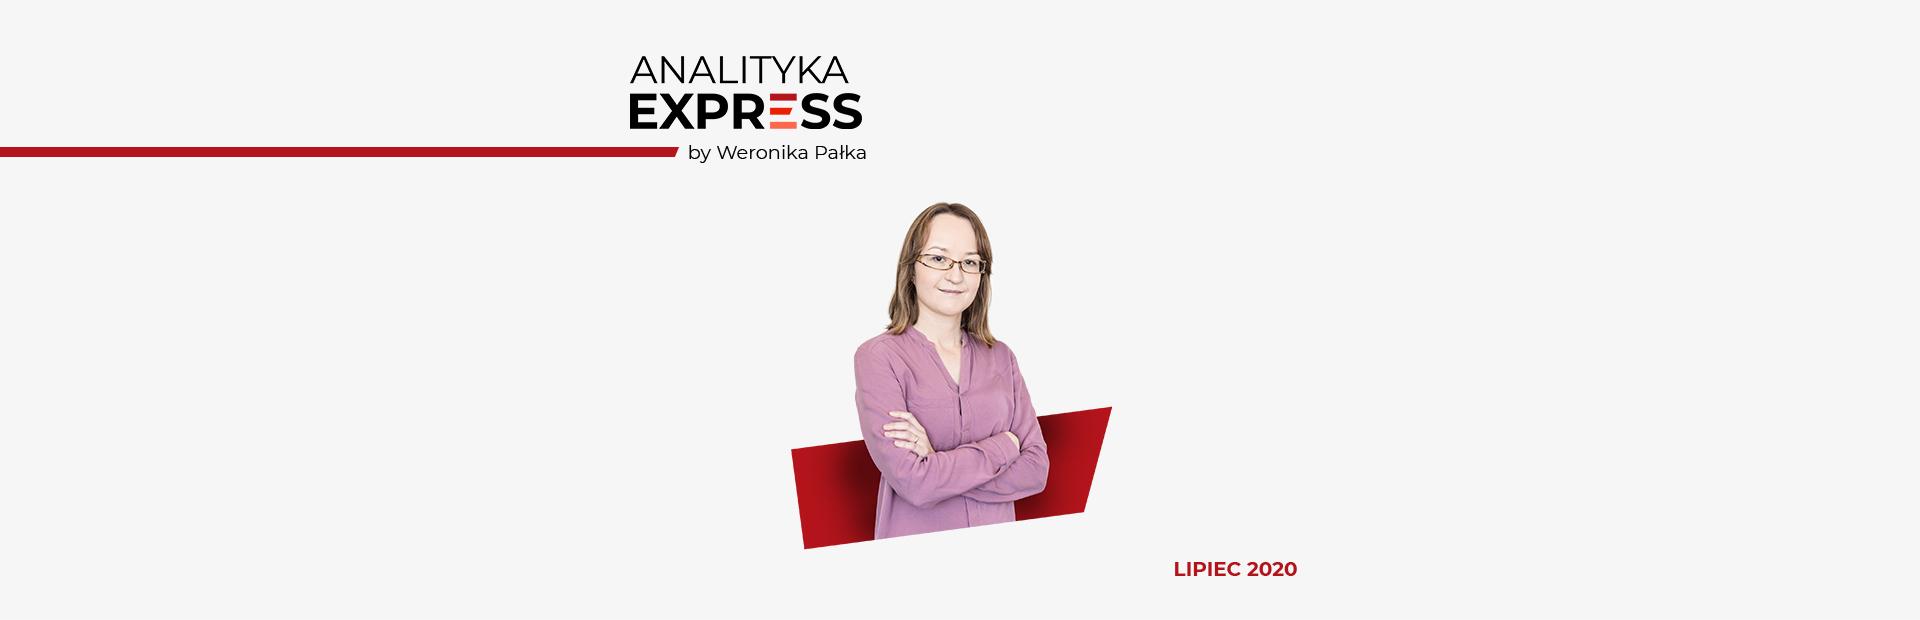 Analityka Express 7/2020